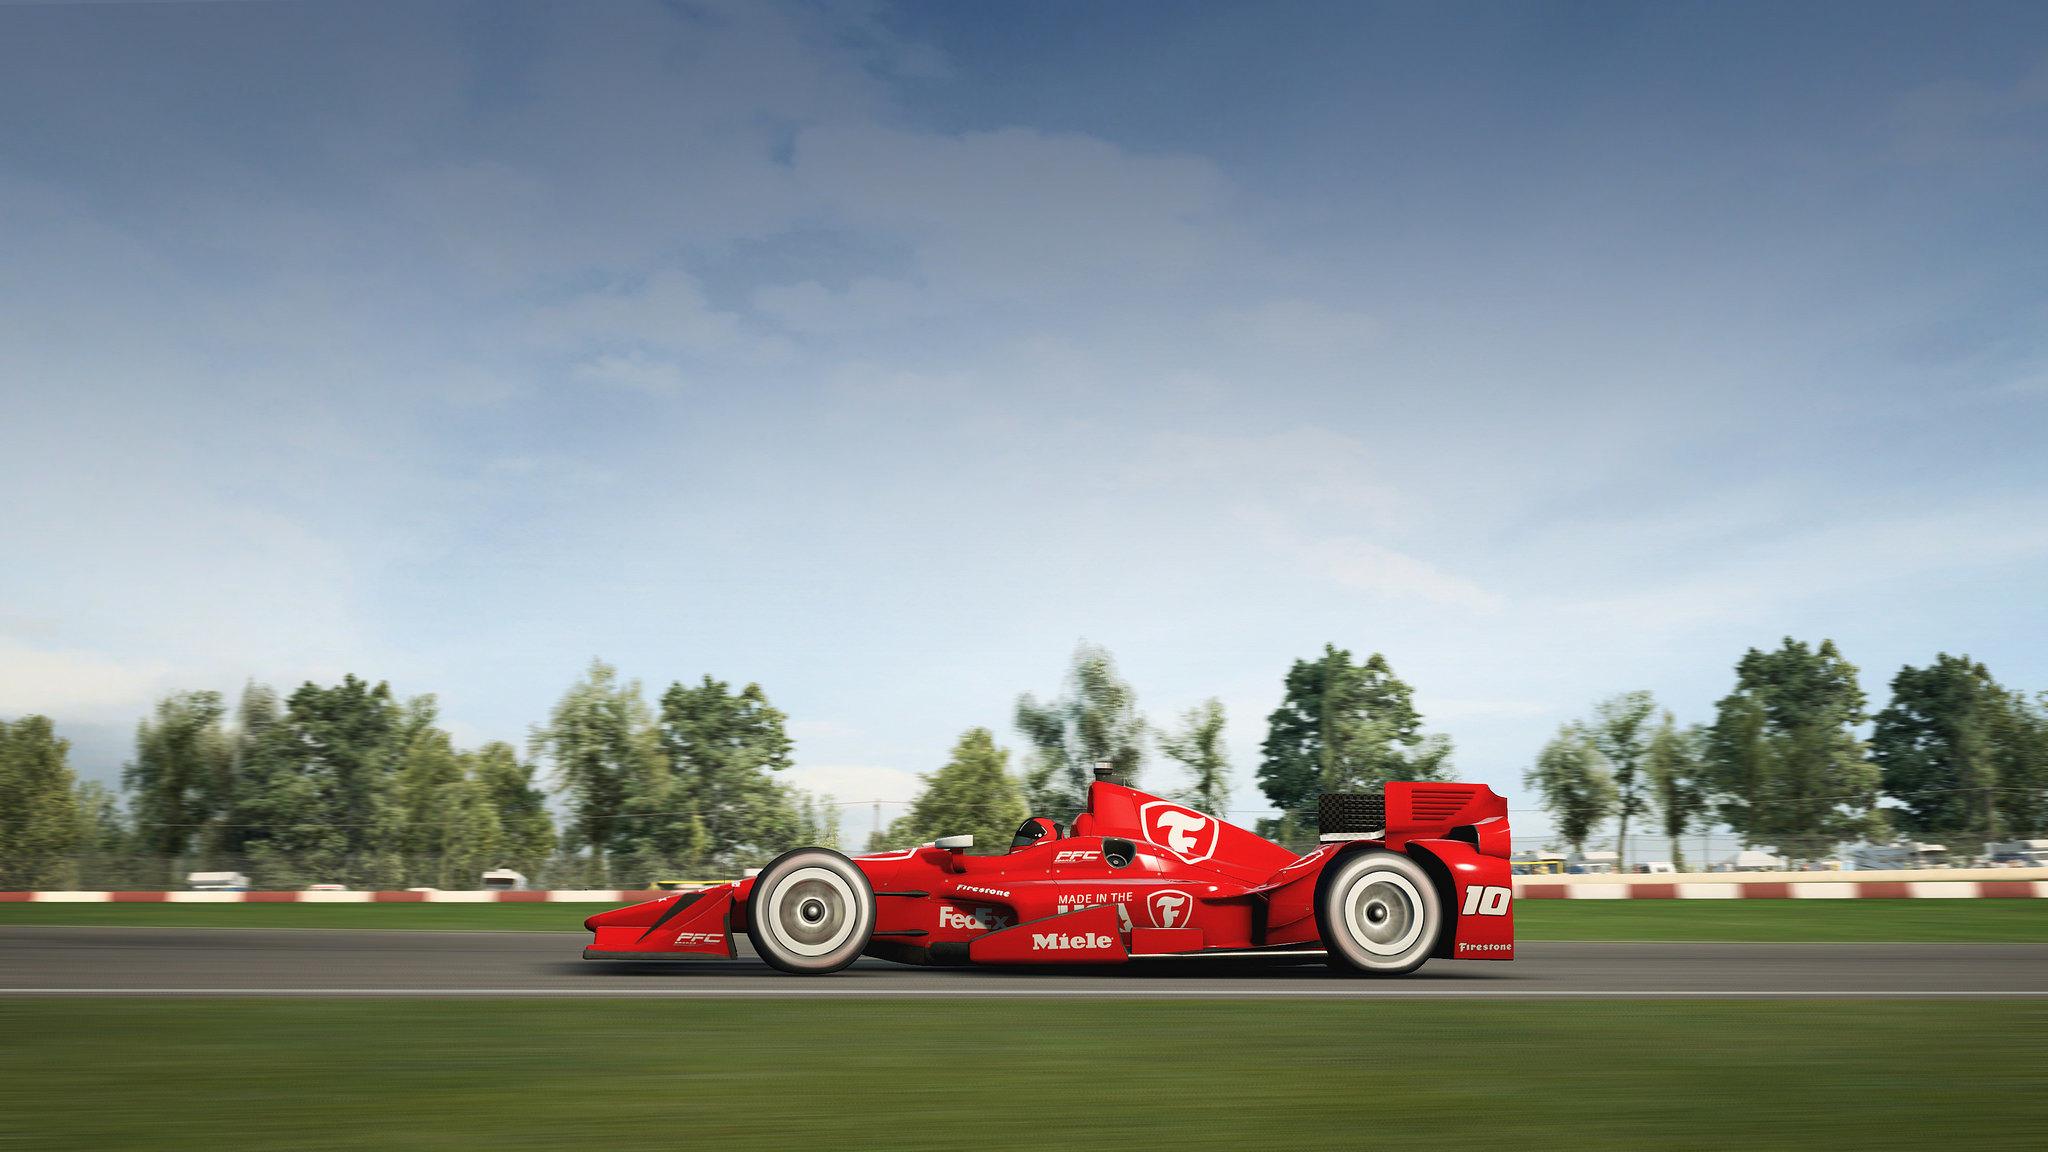 RR Formula US 13